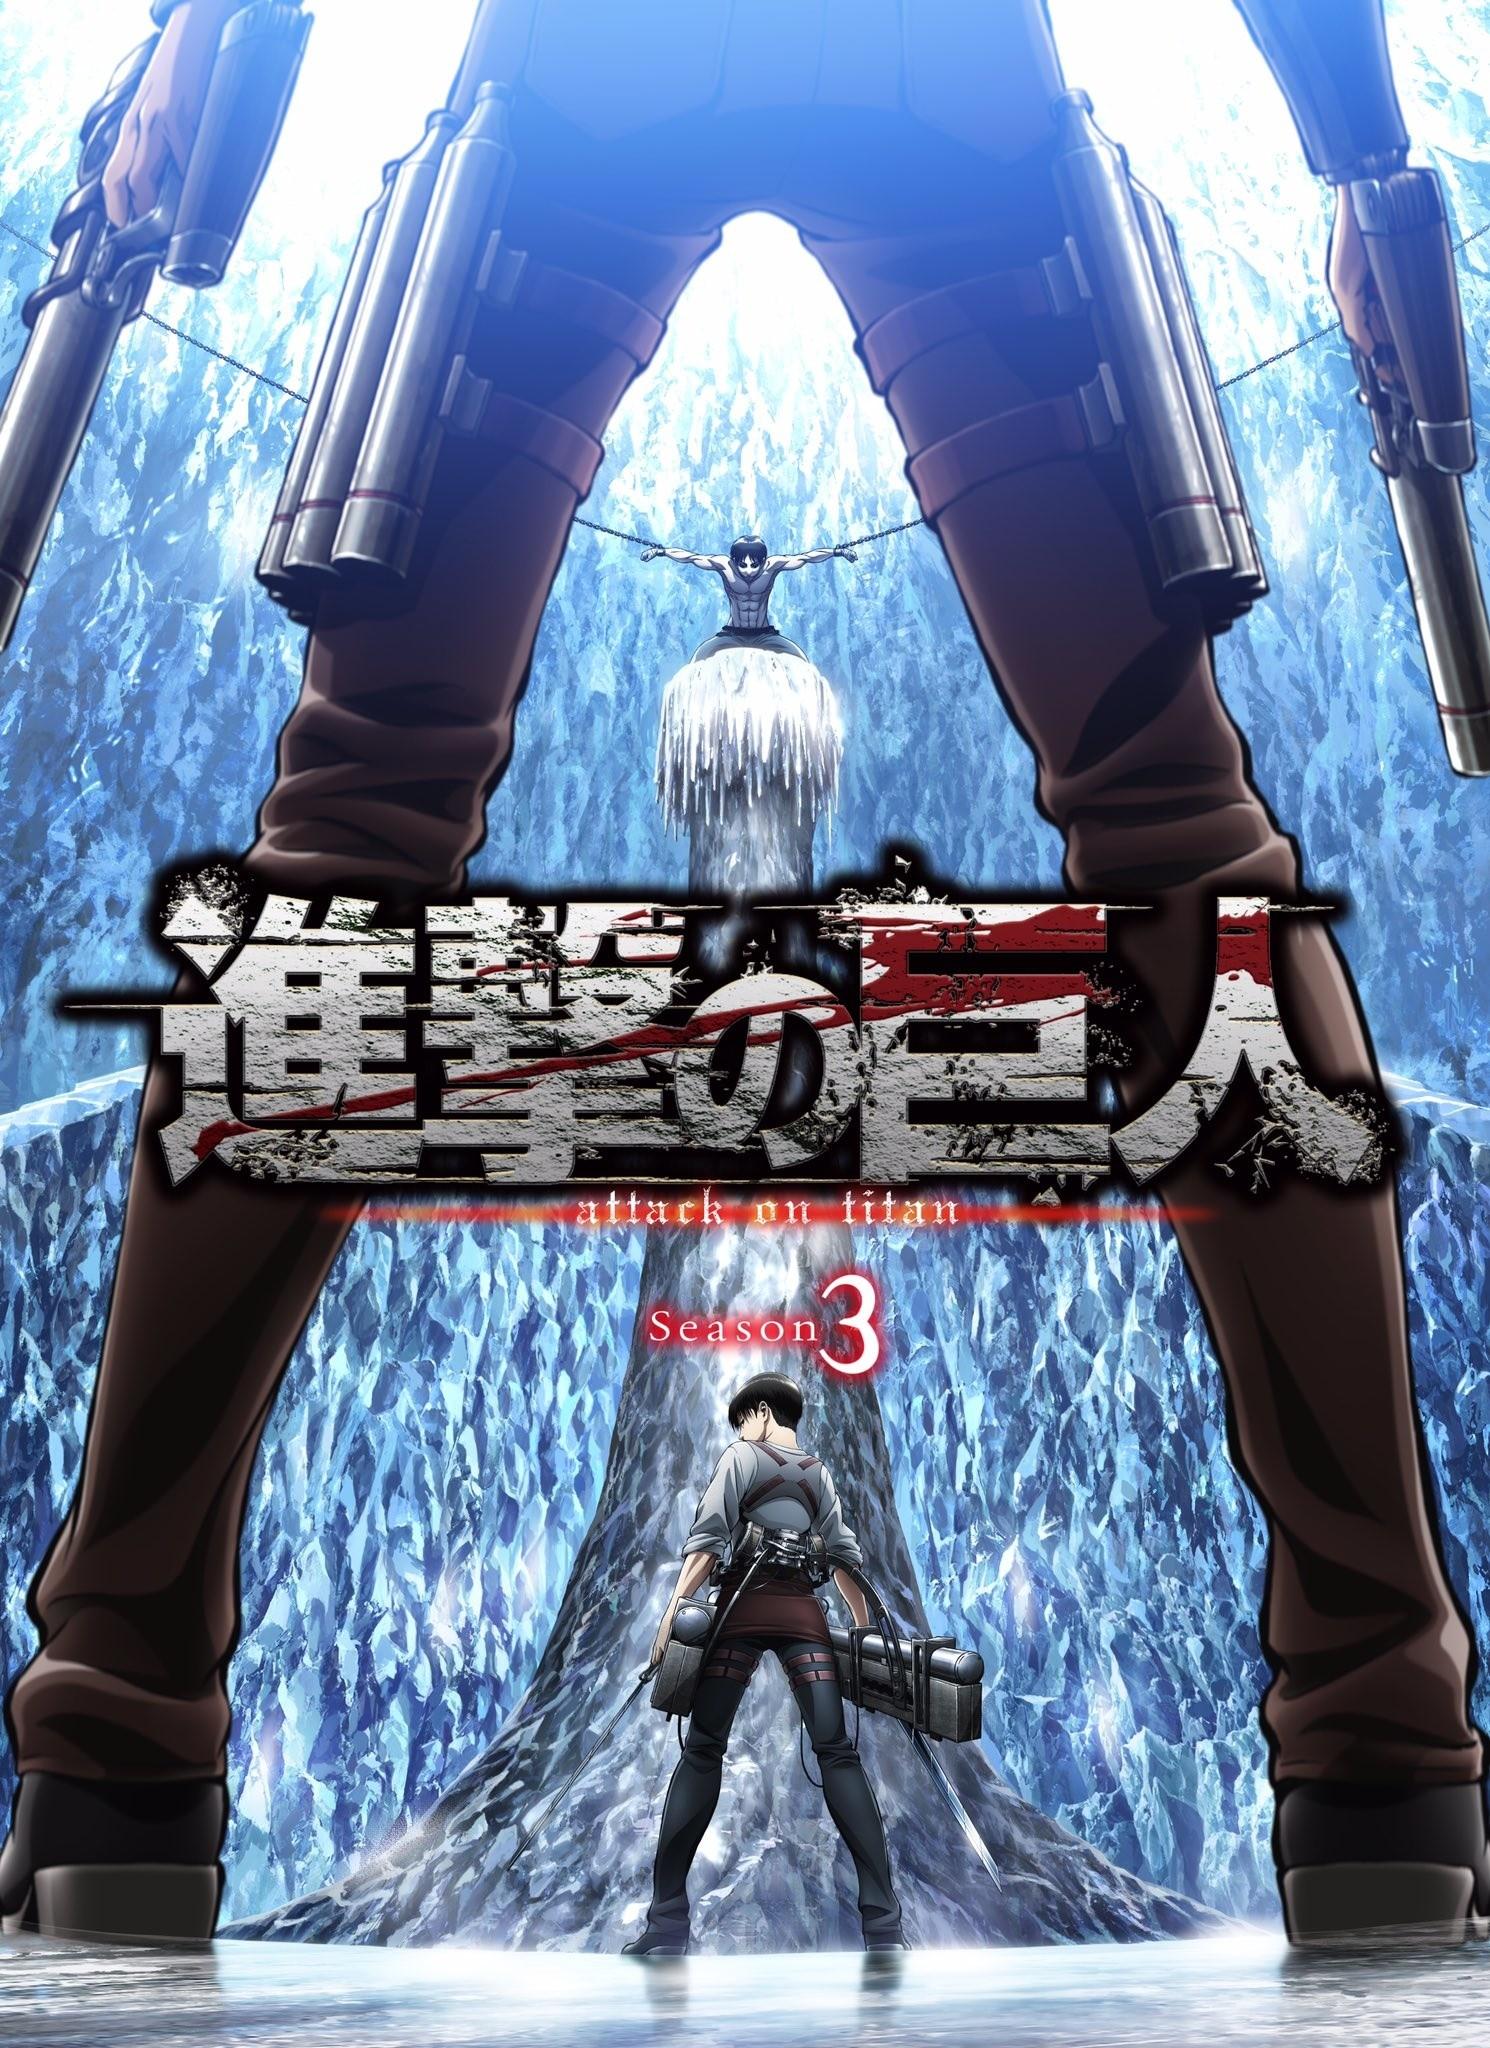 Attack On Titan Anime Season 3 Confirmed For Summer 2018